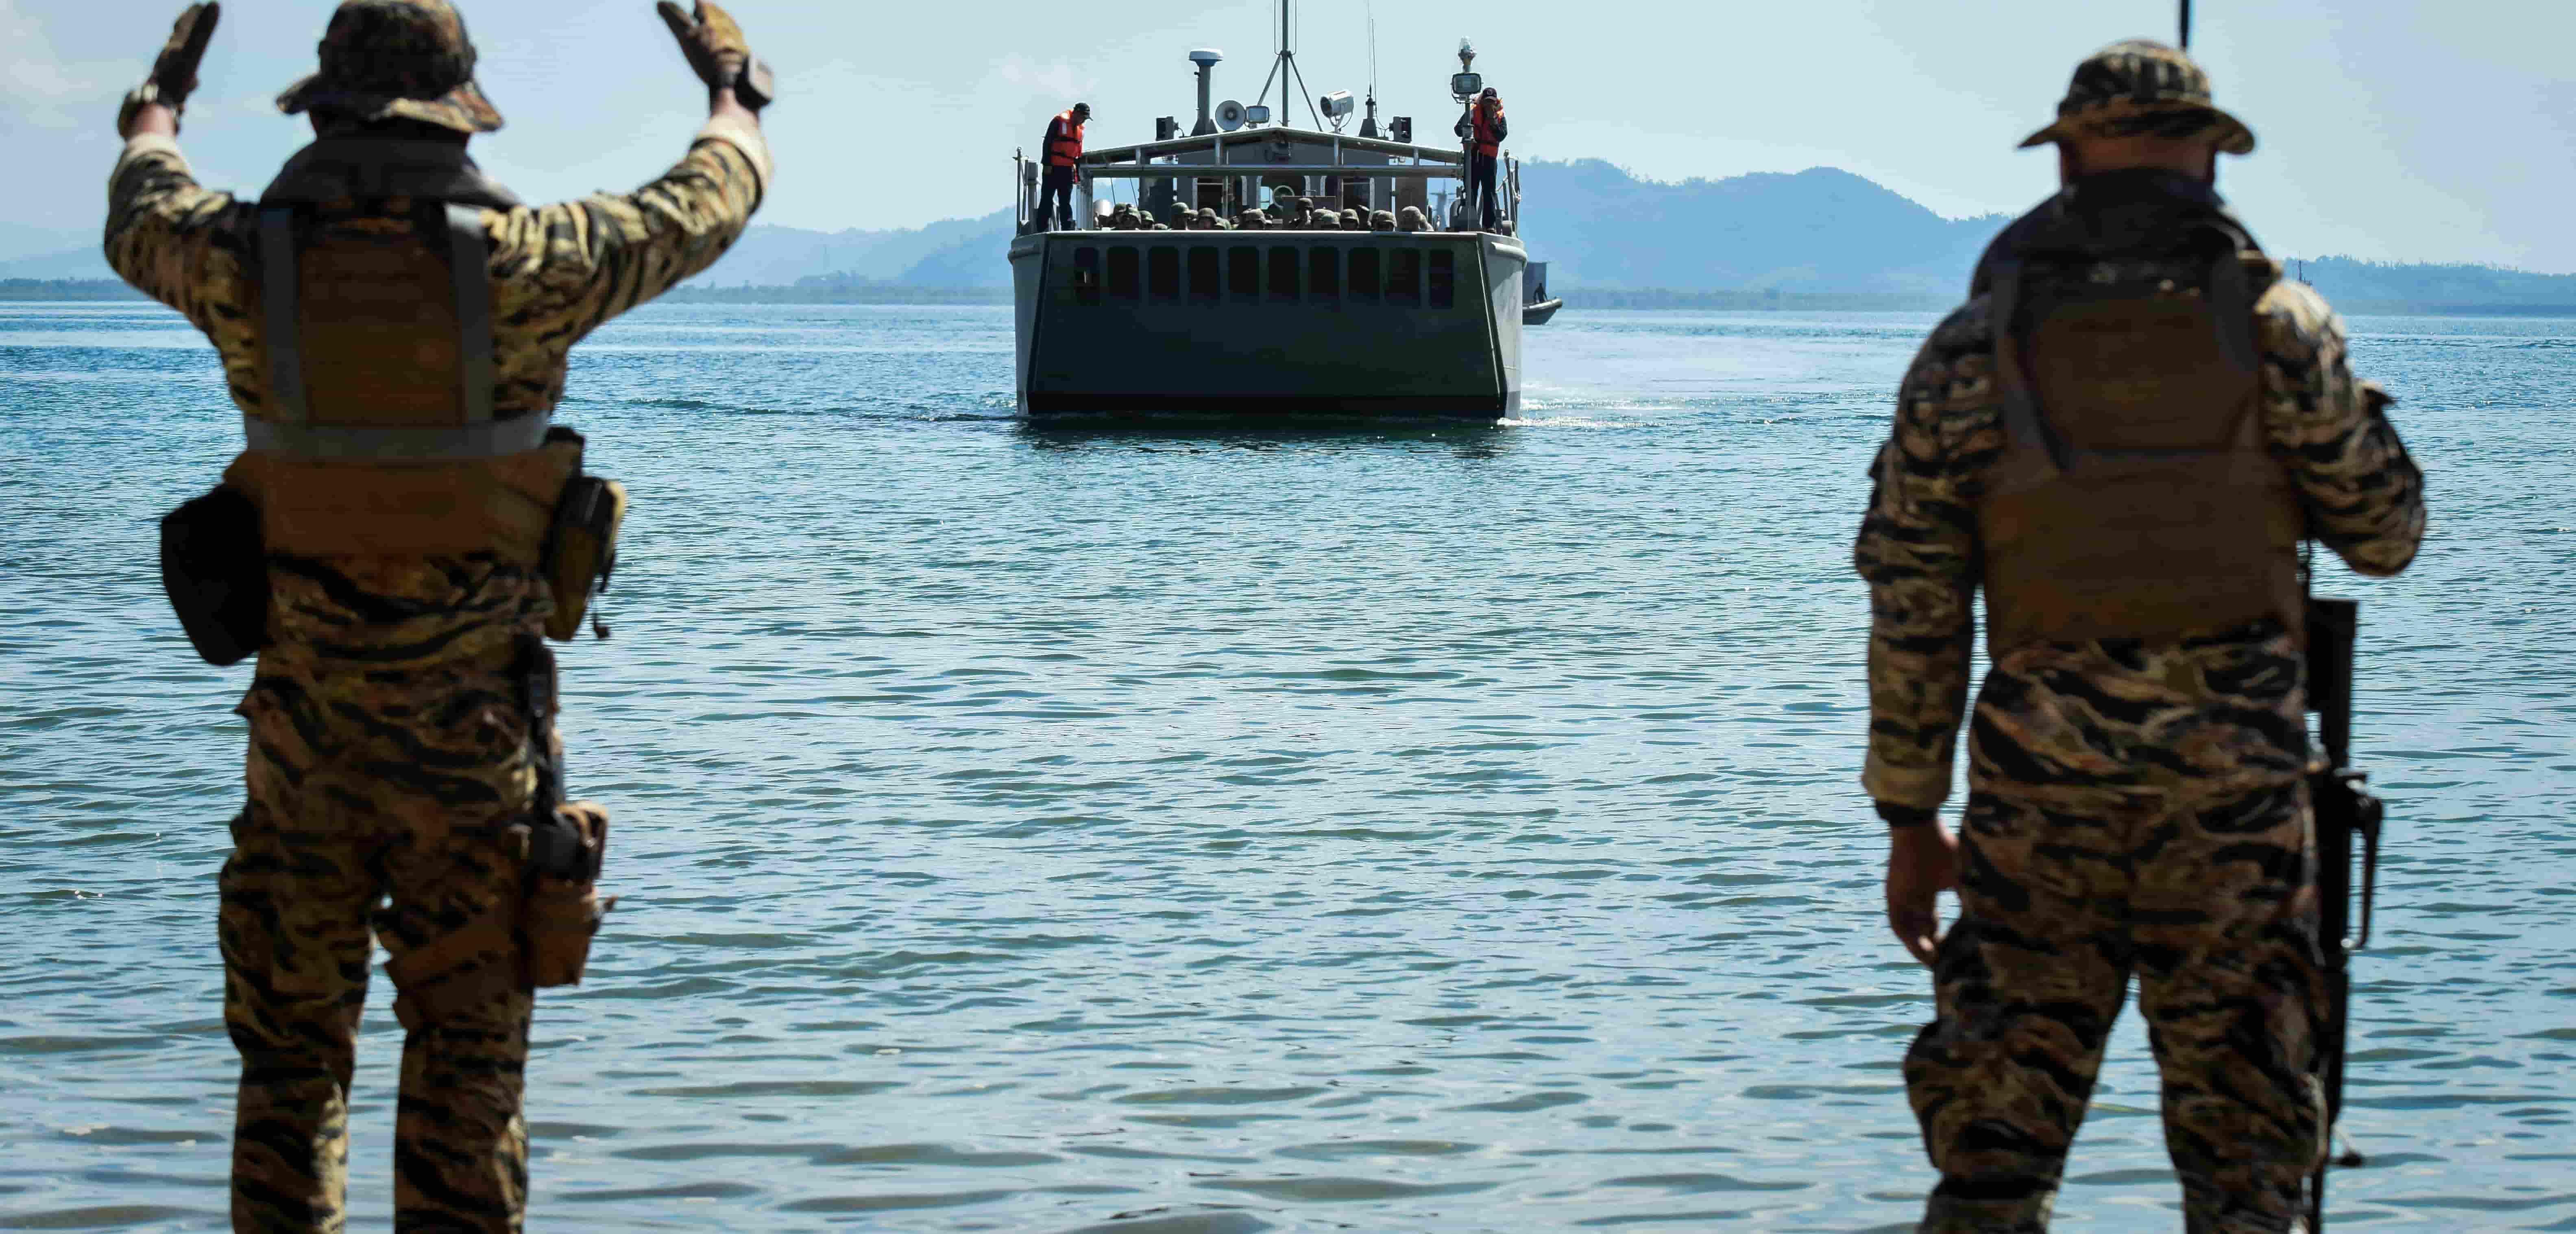 US and Philippine troops during the Balikatan war games in May 2017 (Photo: Dondi Tawatao/Getty)